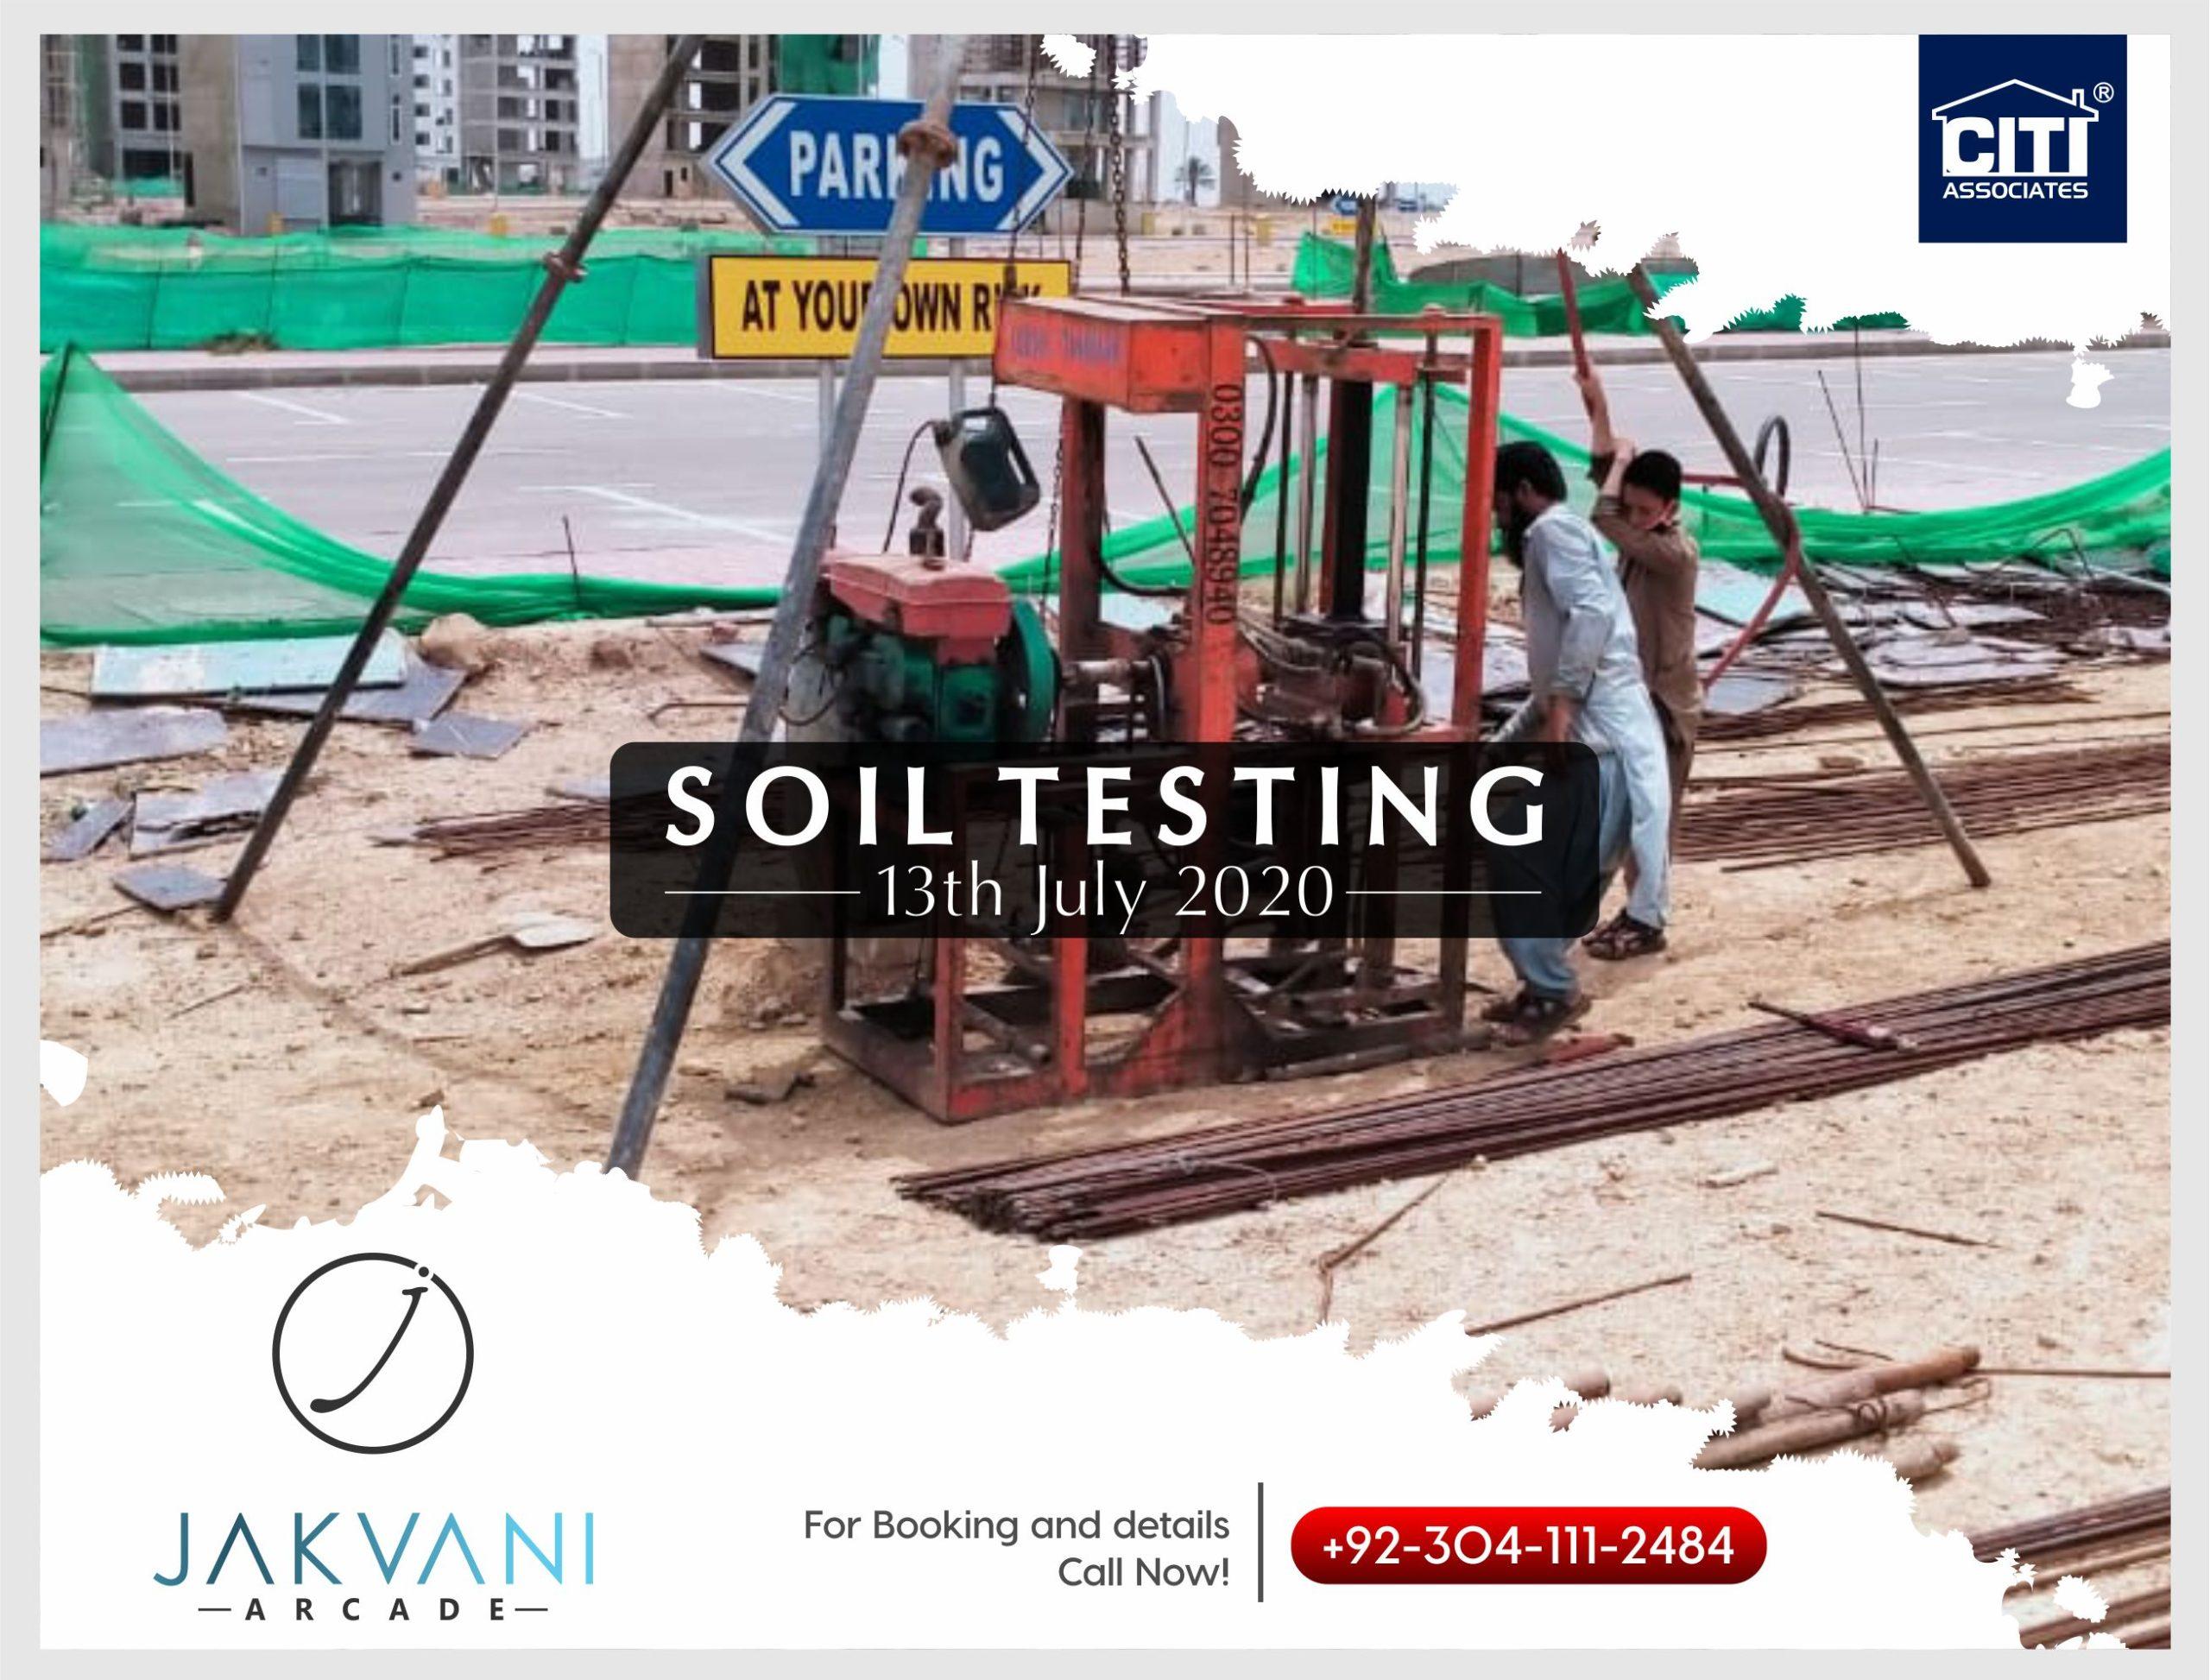 Soil Testing | Jakvani Arcade | Bahria Town Karachi